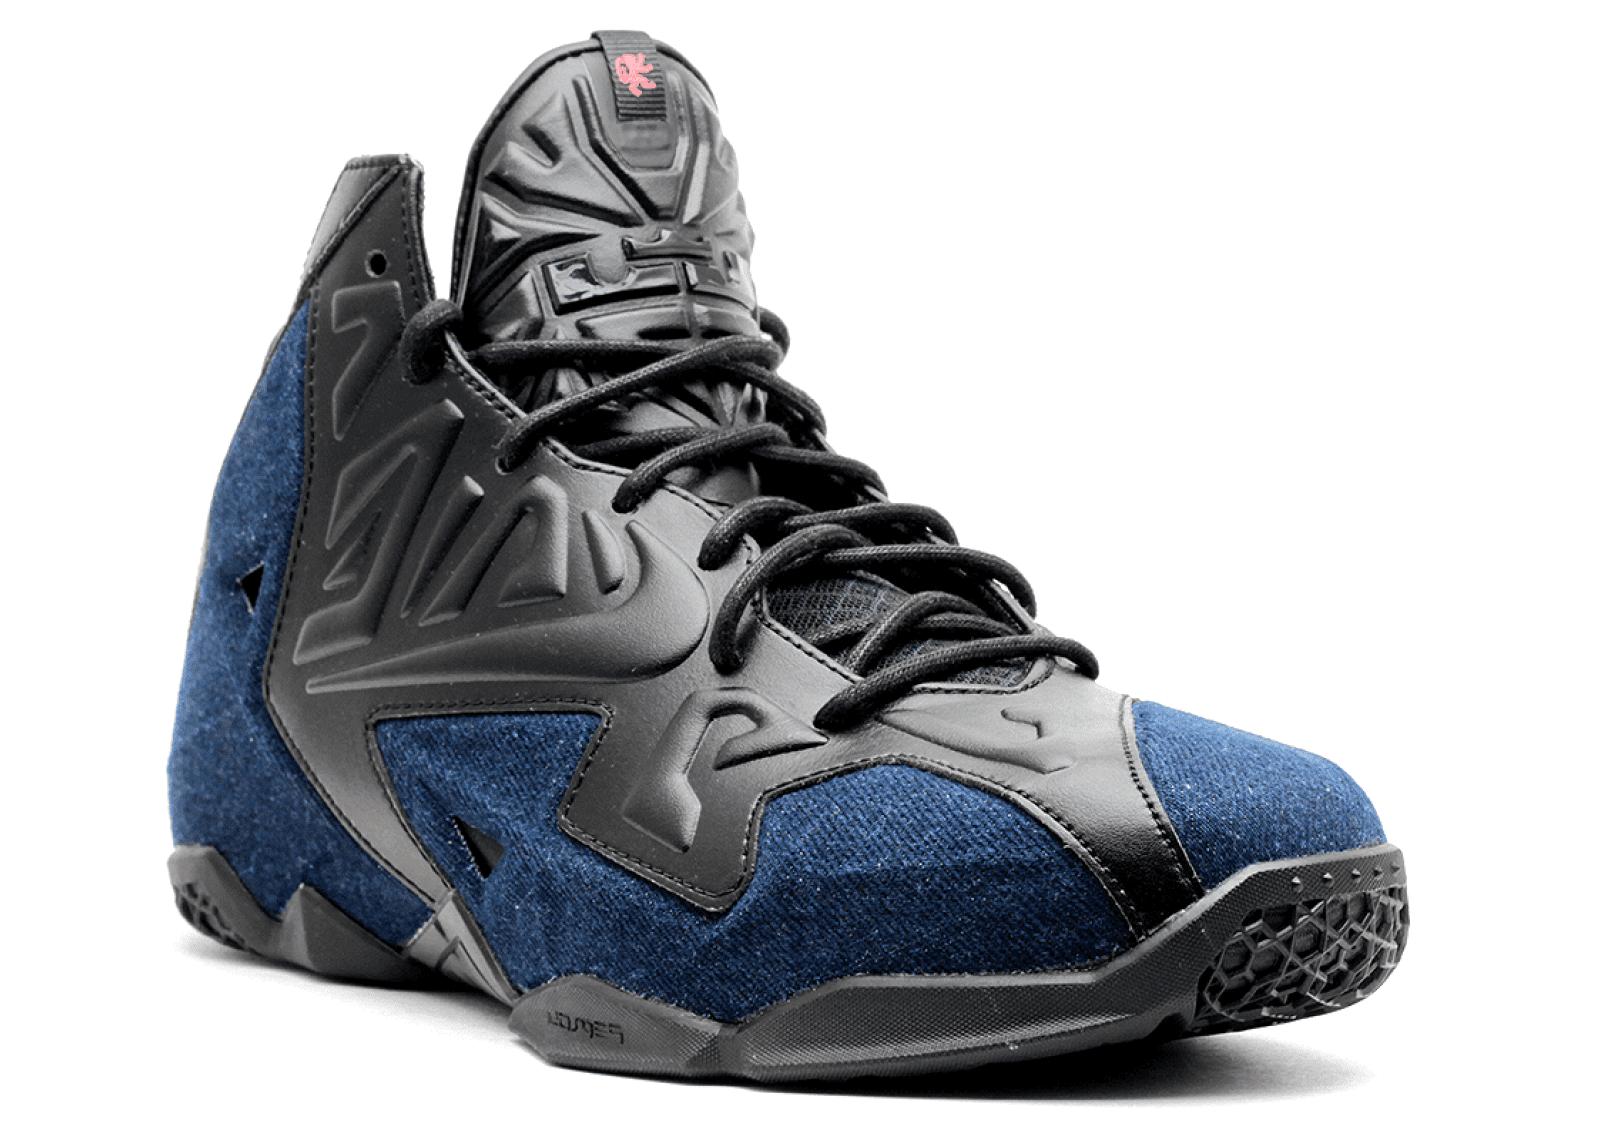 Nike - LEBRON 11 EXT DENIM QS 'DENIM